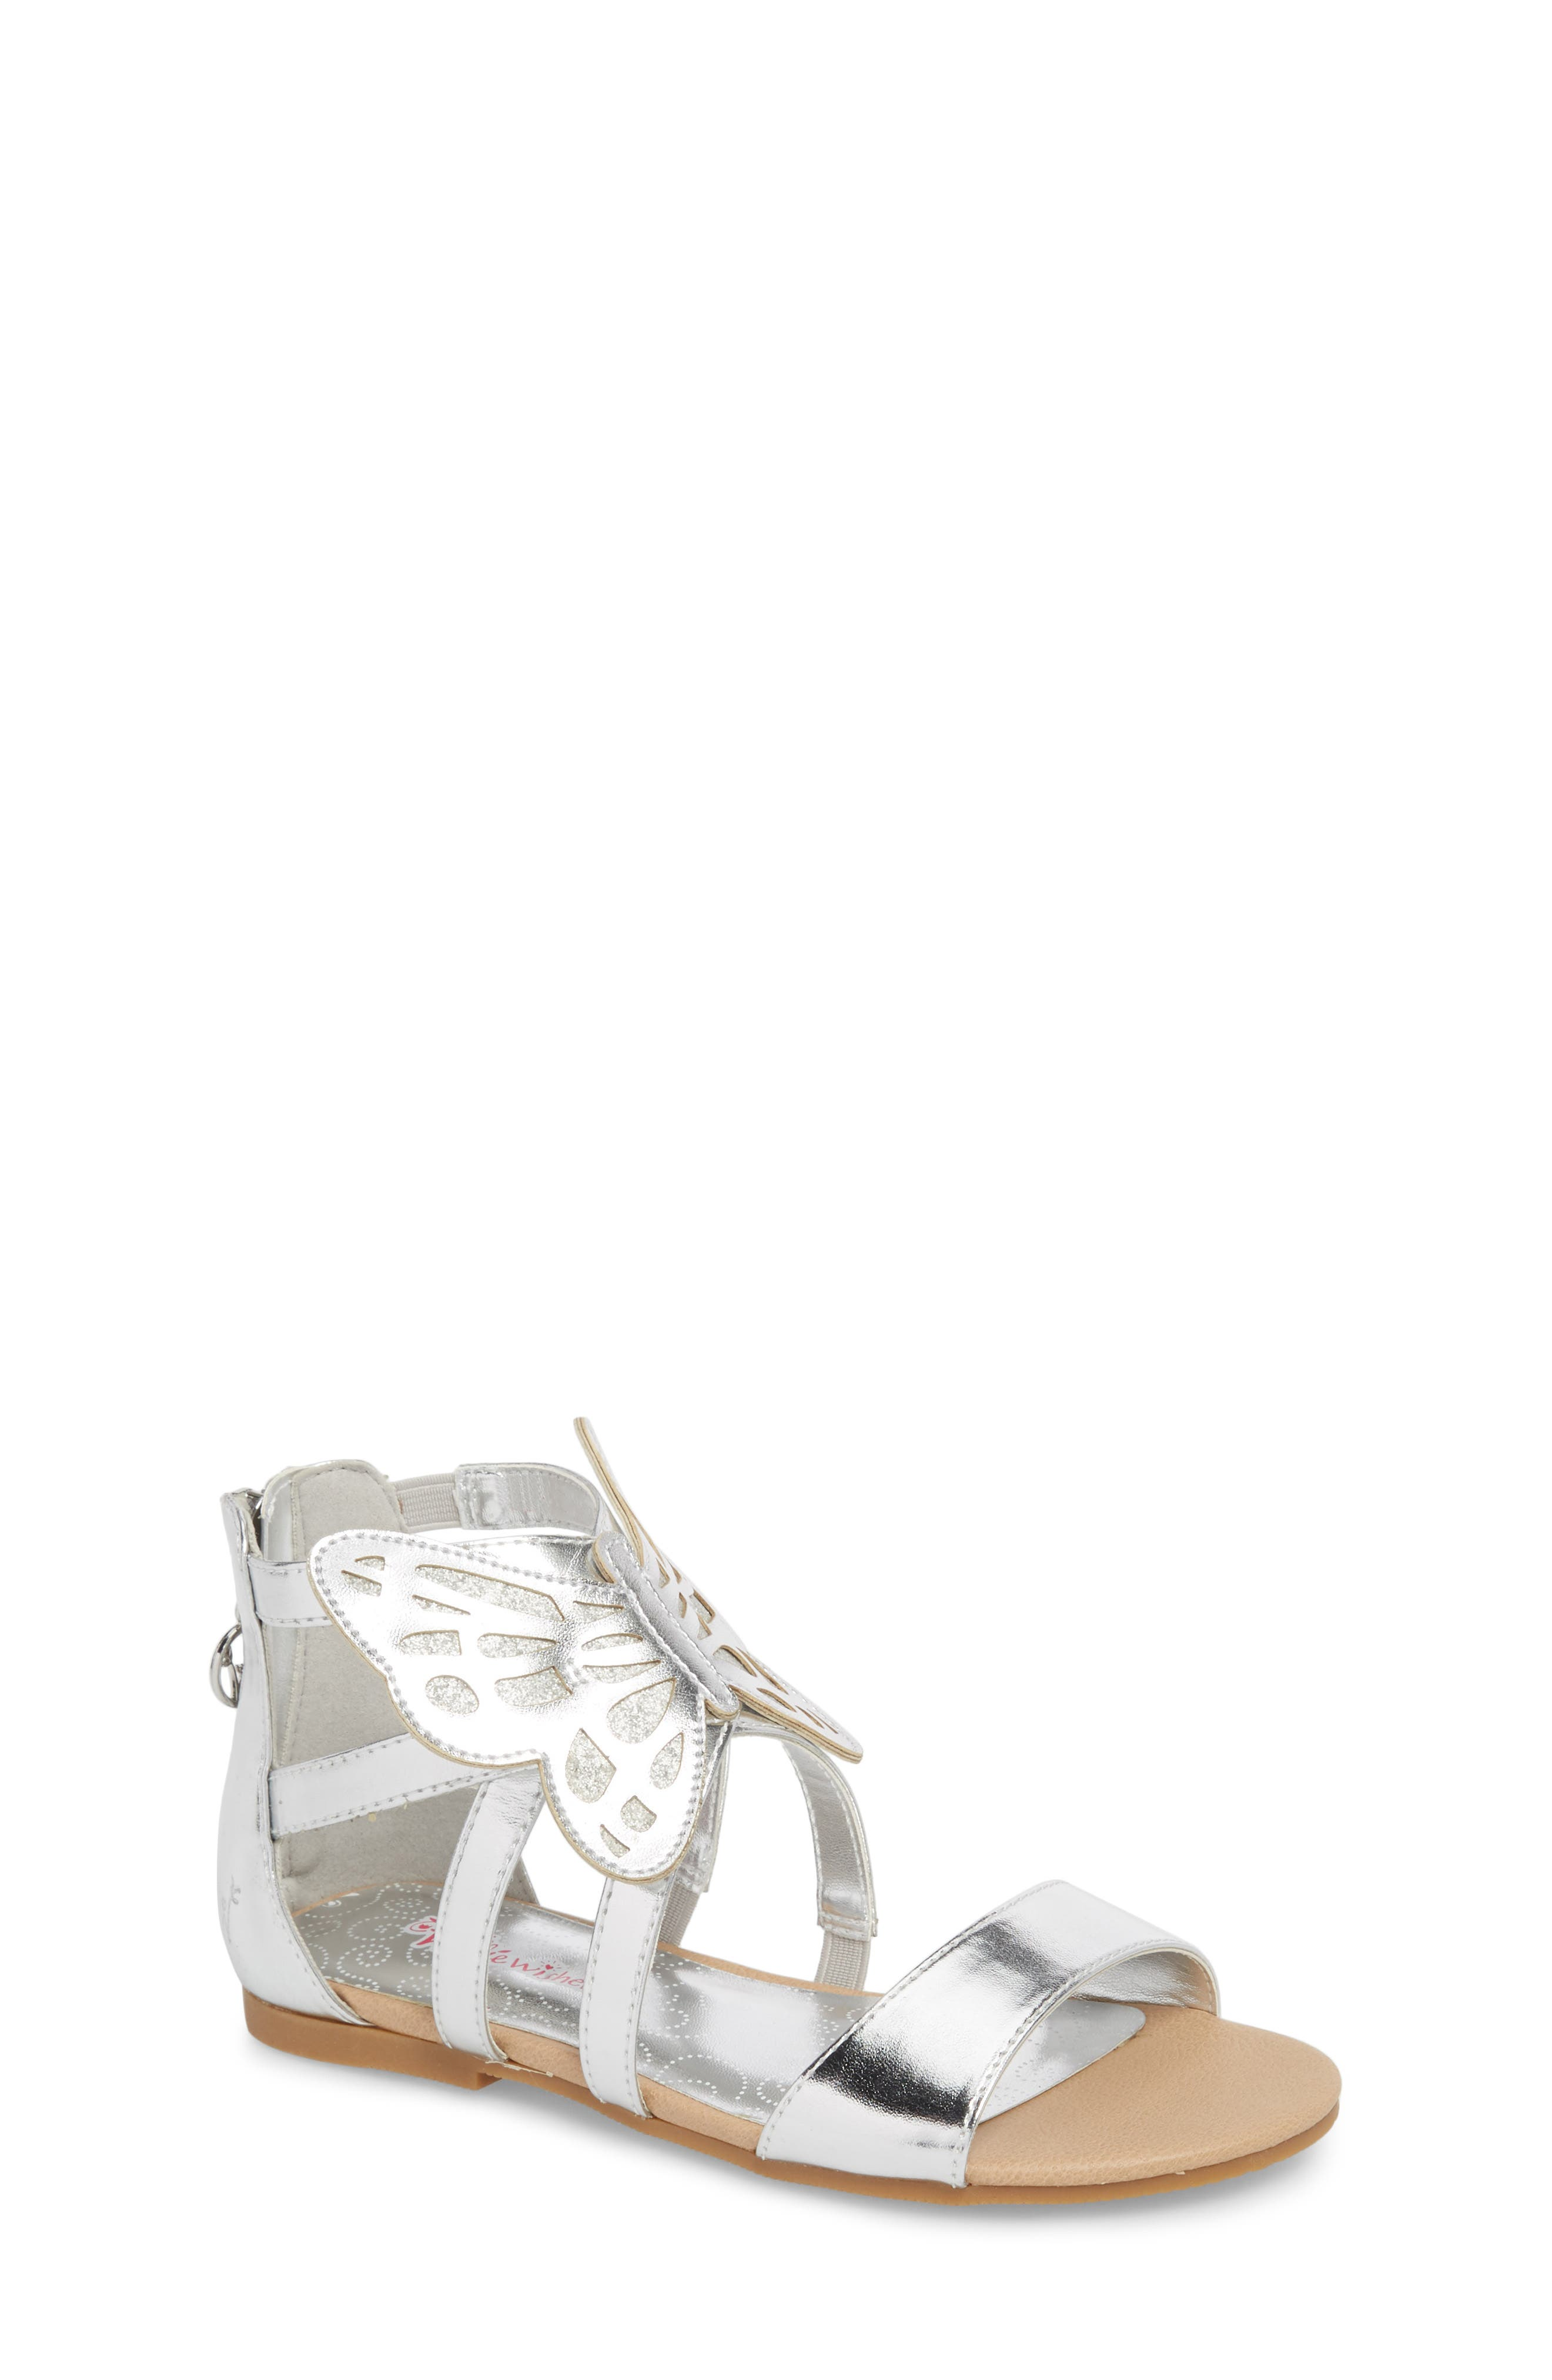 Willa Flutter Metallic Sandal,                         Main,                         color, Silver Metallic